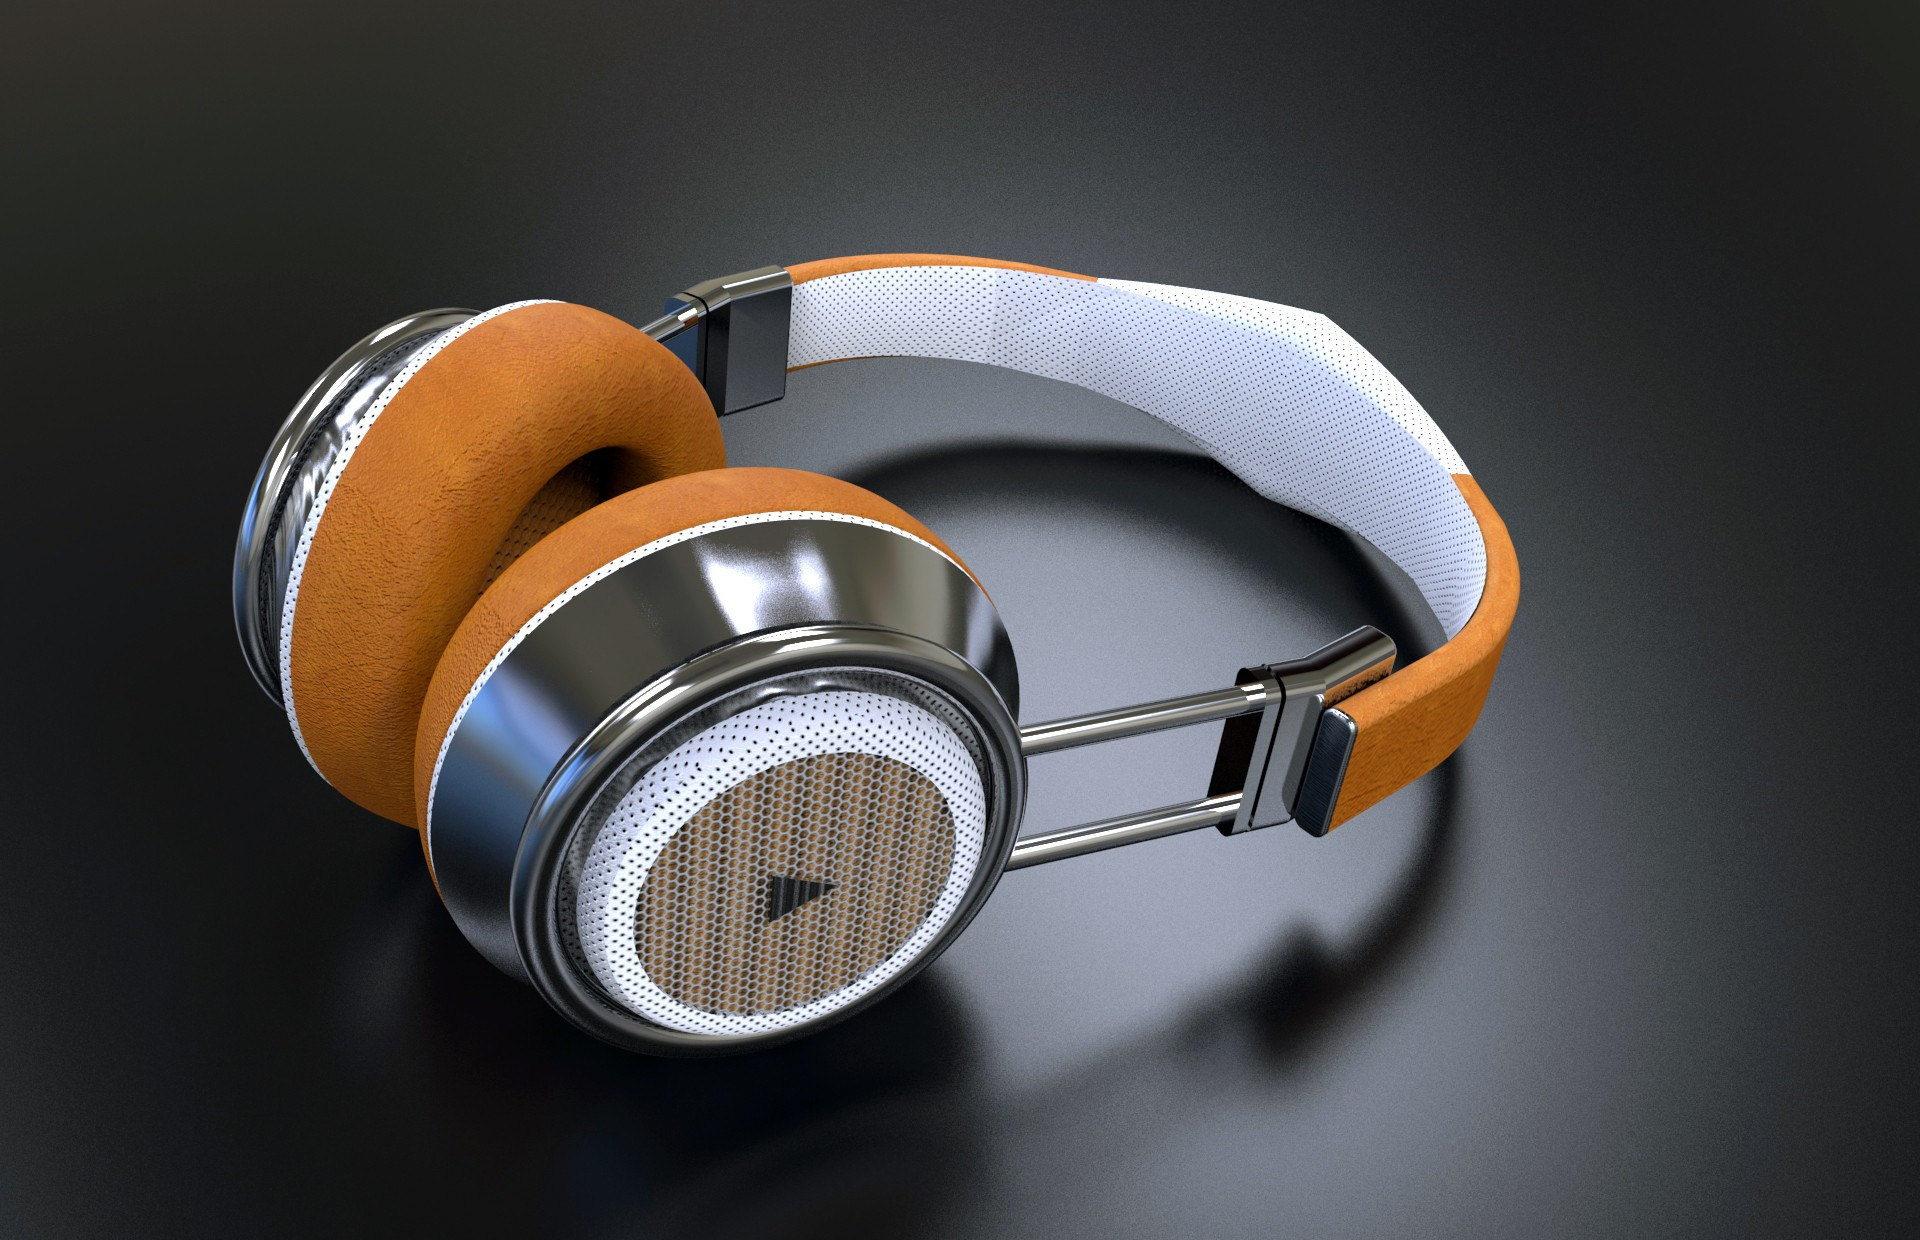 Headphone project